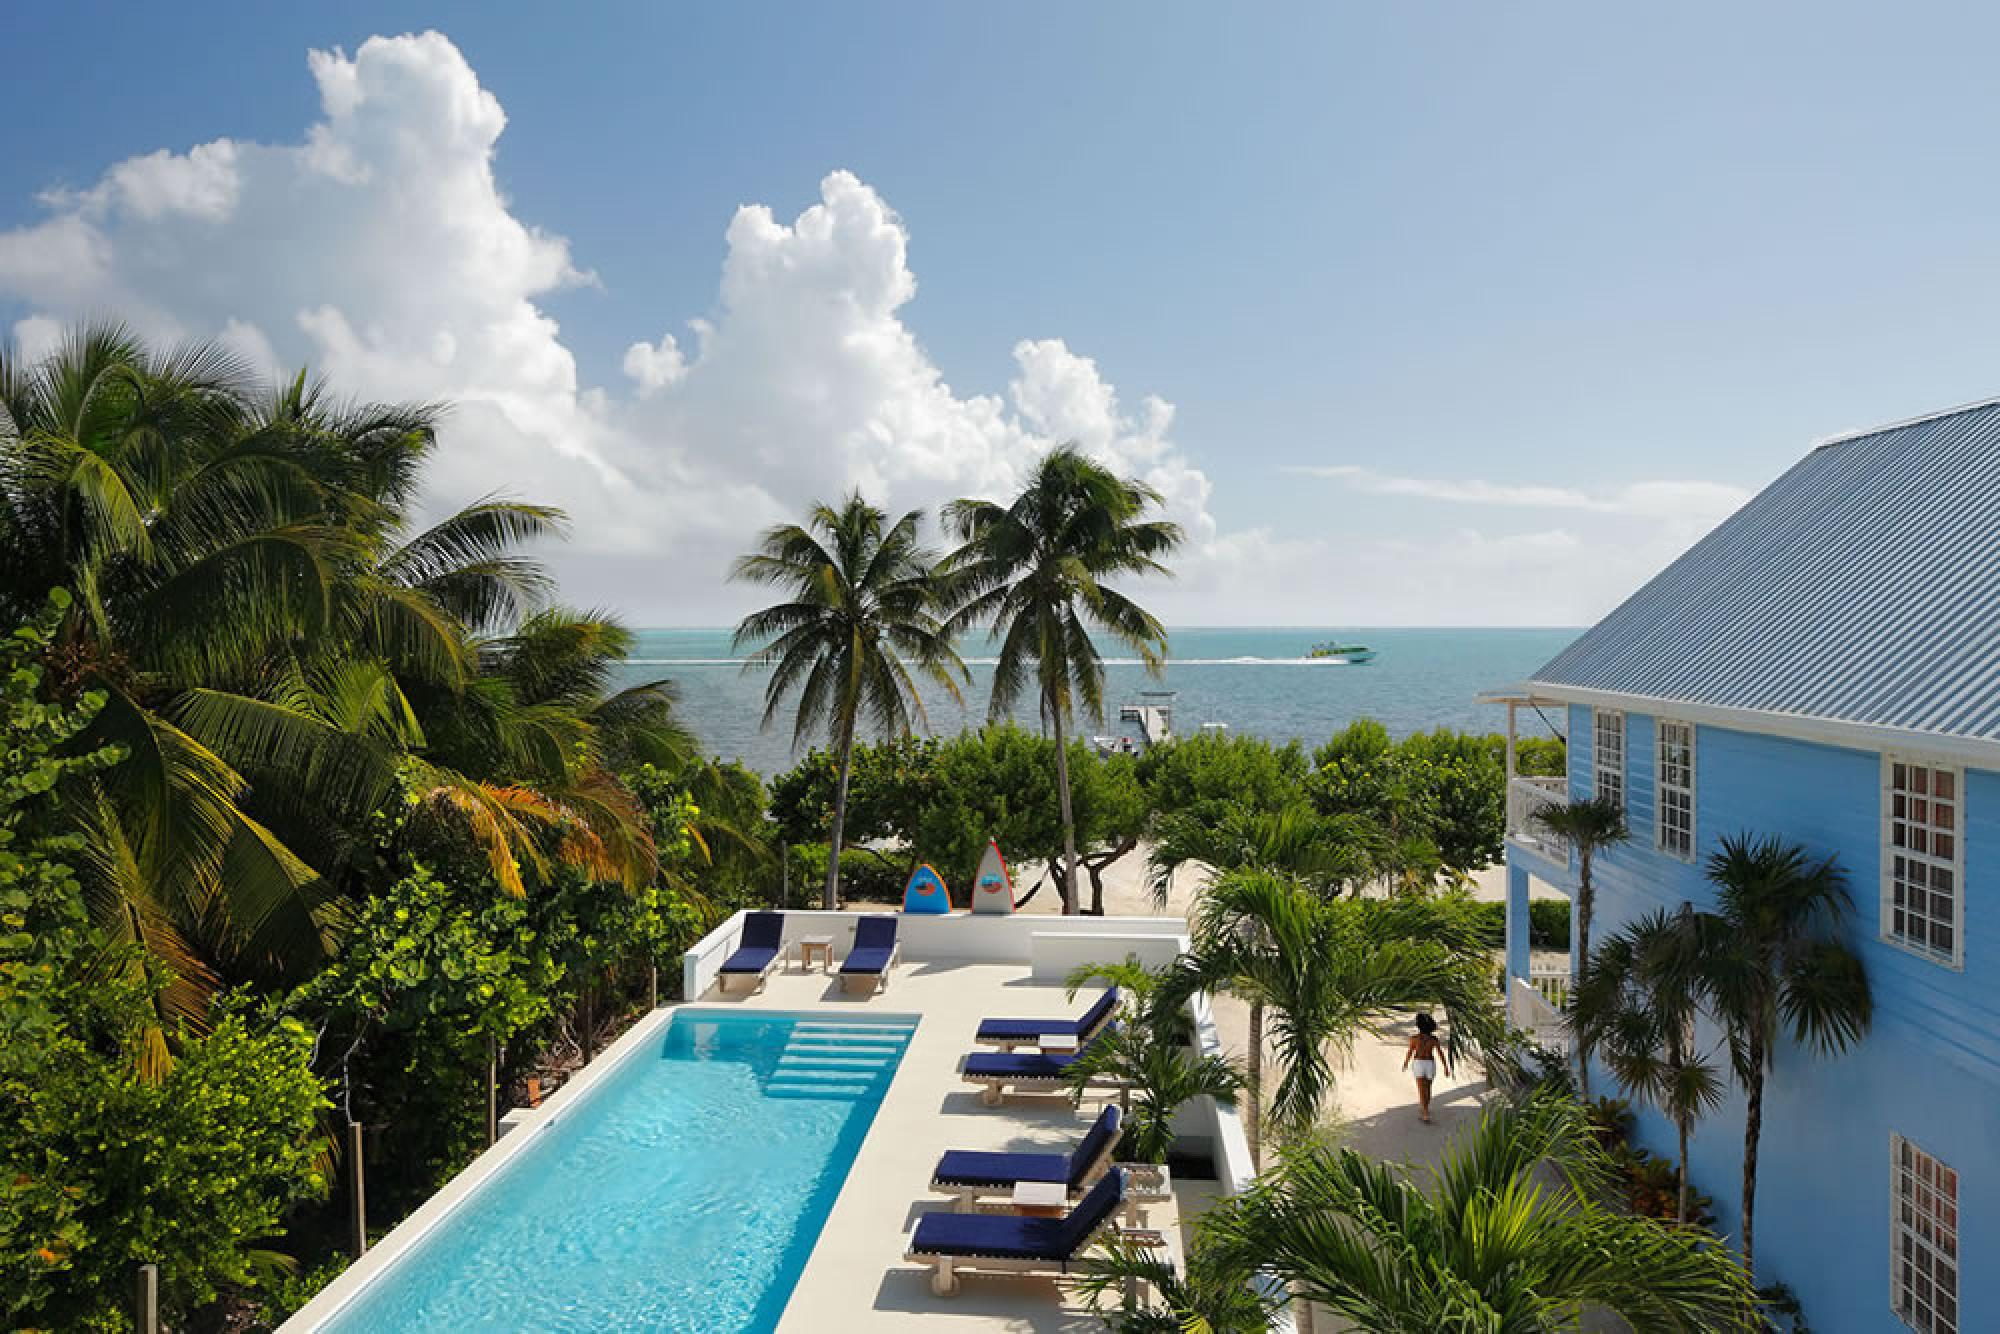 Weezie's Caye Caulker - Caye Caulker, Belize